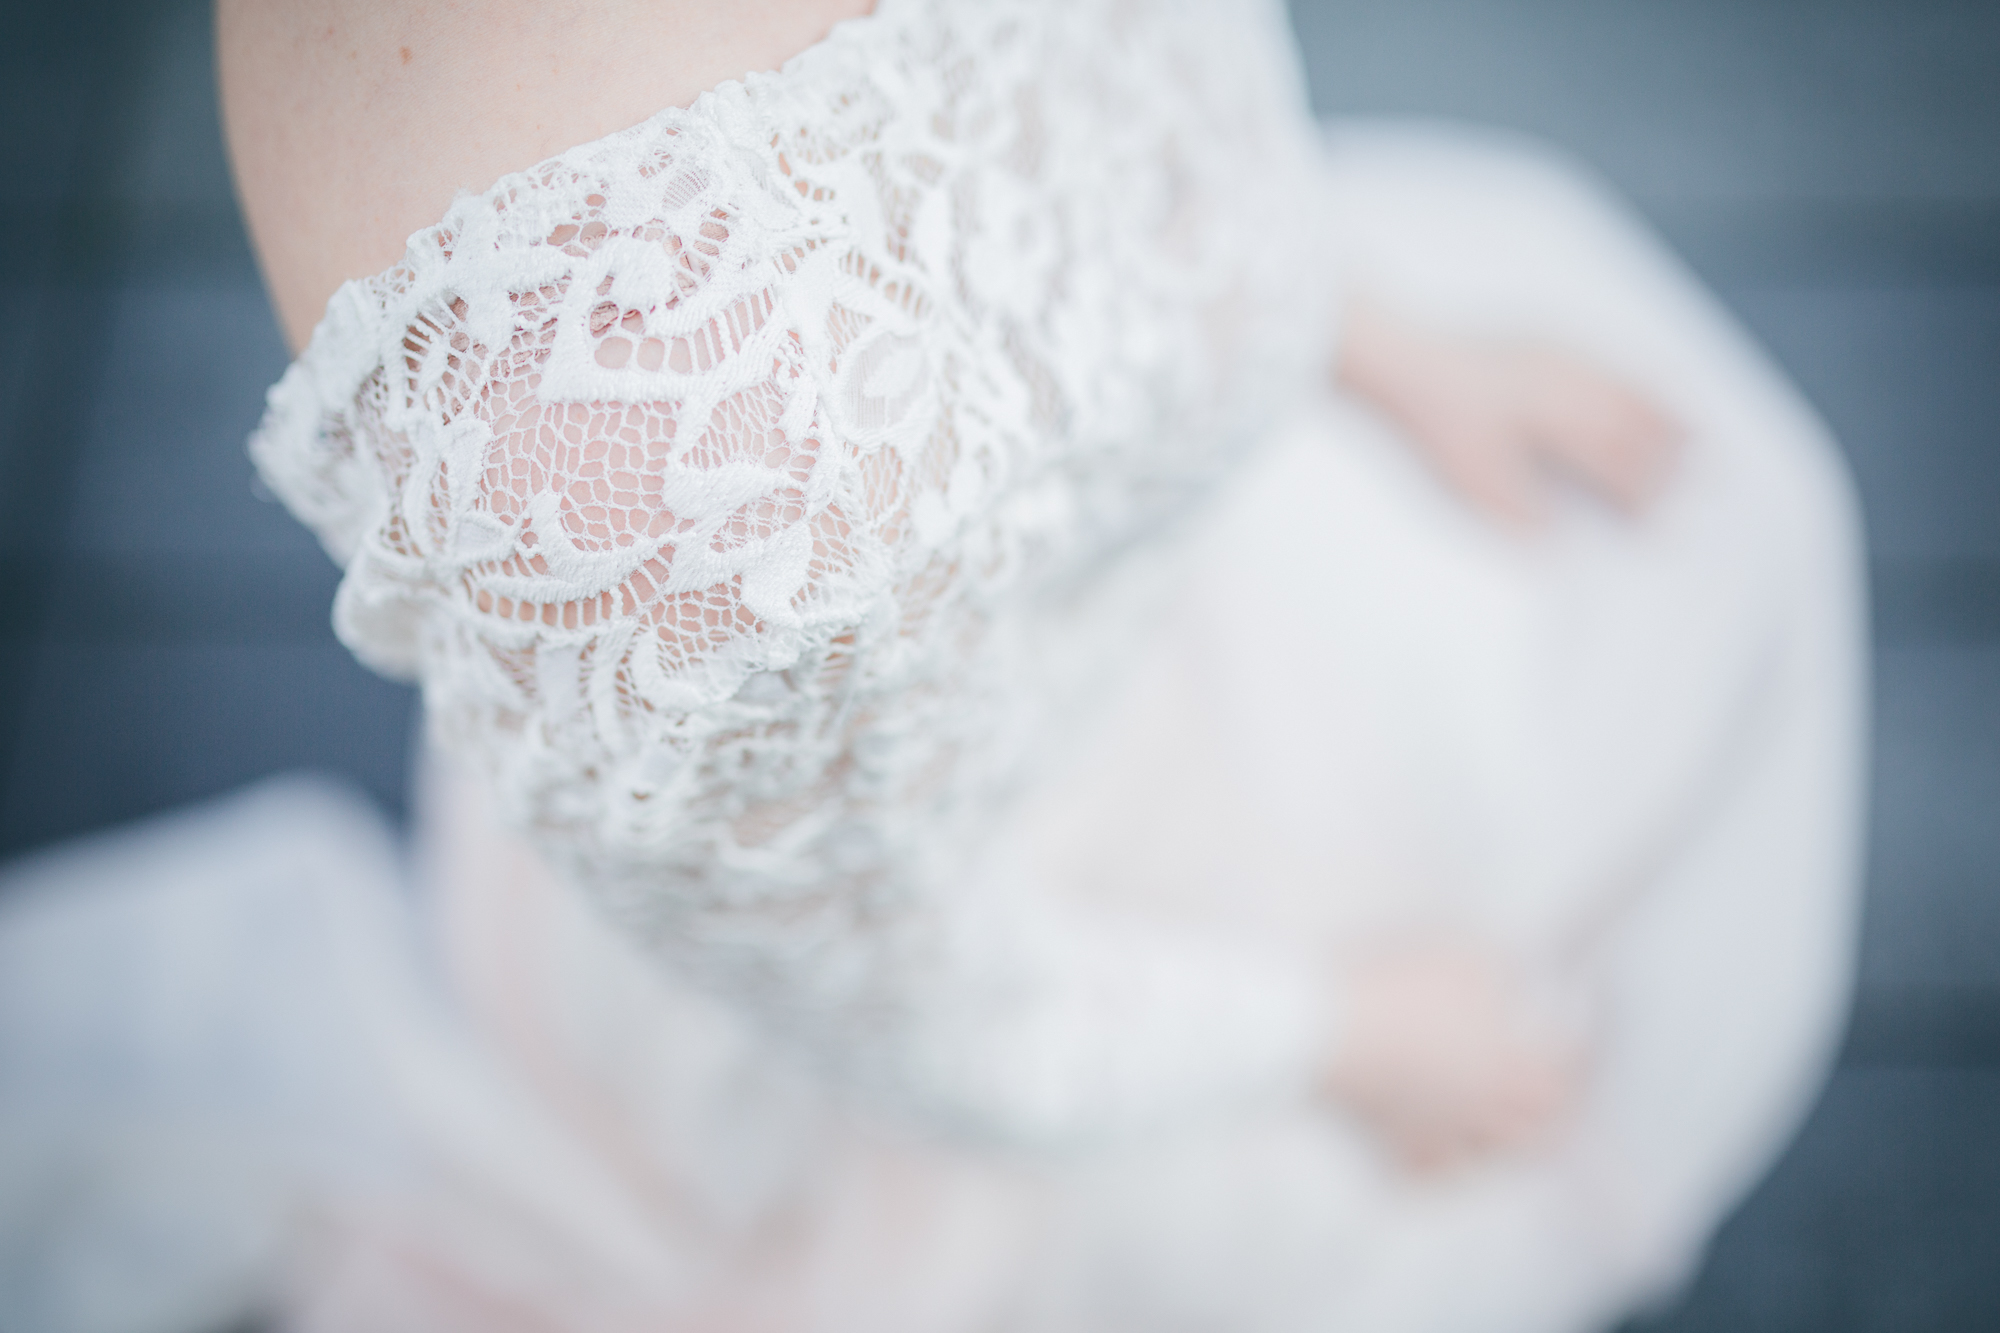 weddingphotographer_lindarehlin_preweddingphoto_london_SensibleM-96.jpg